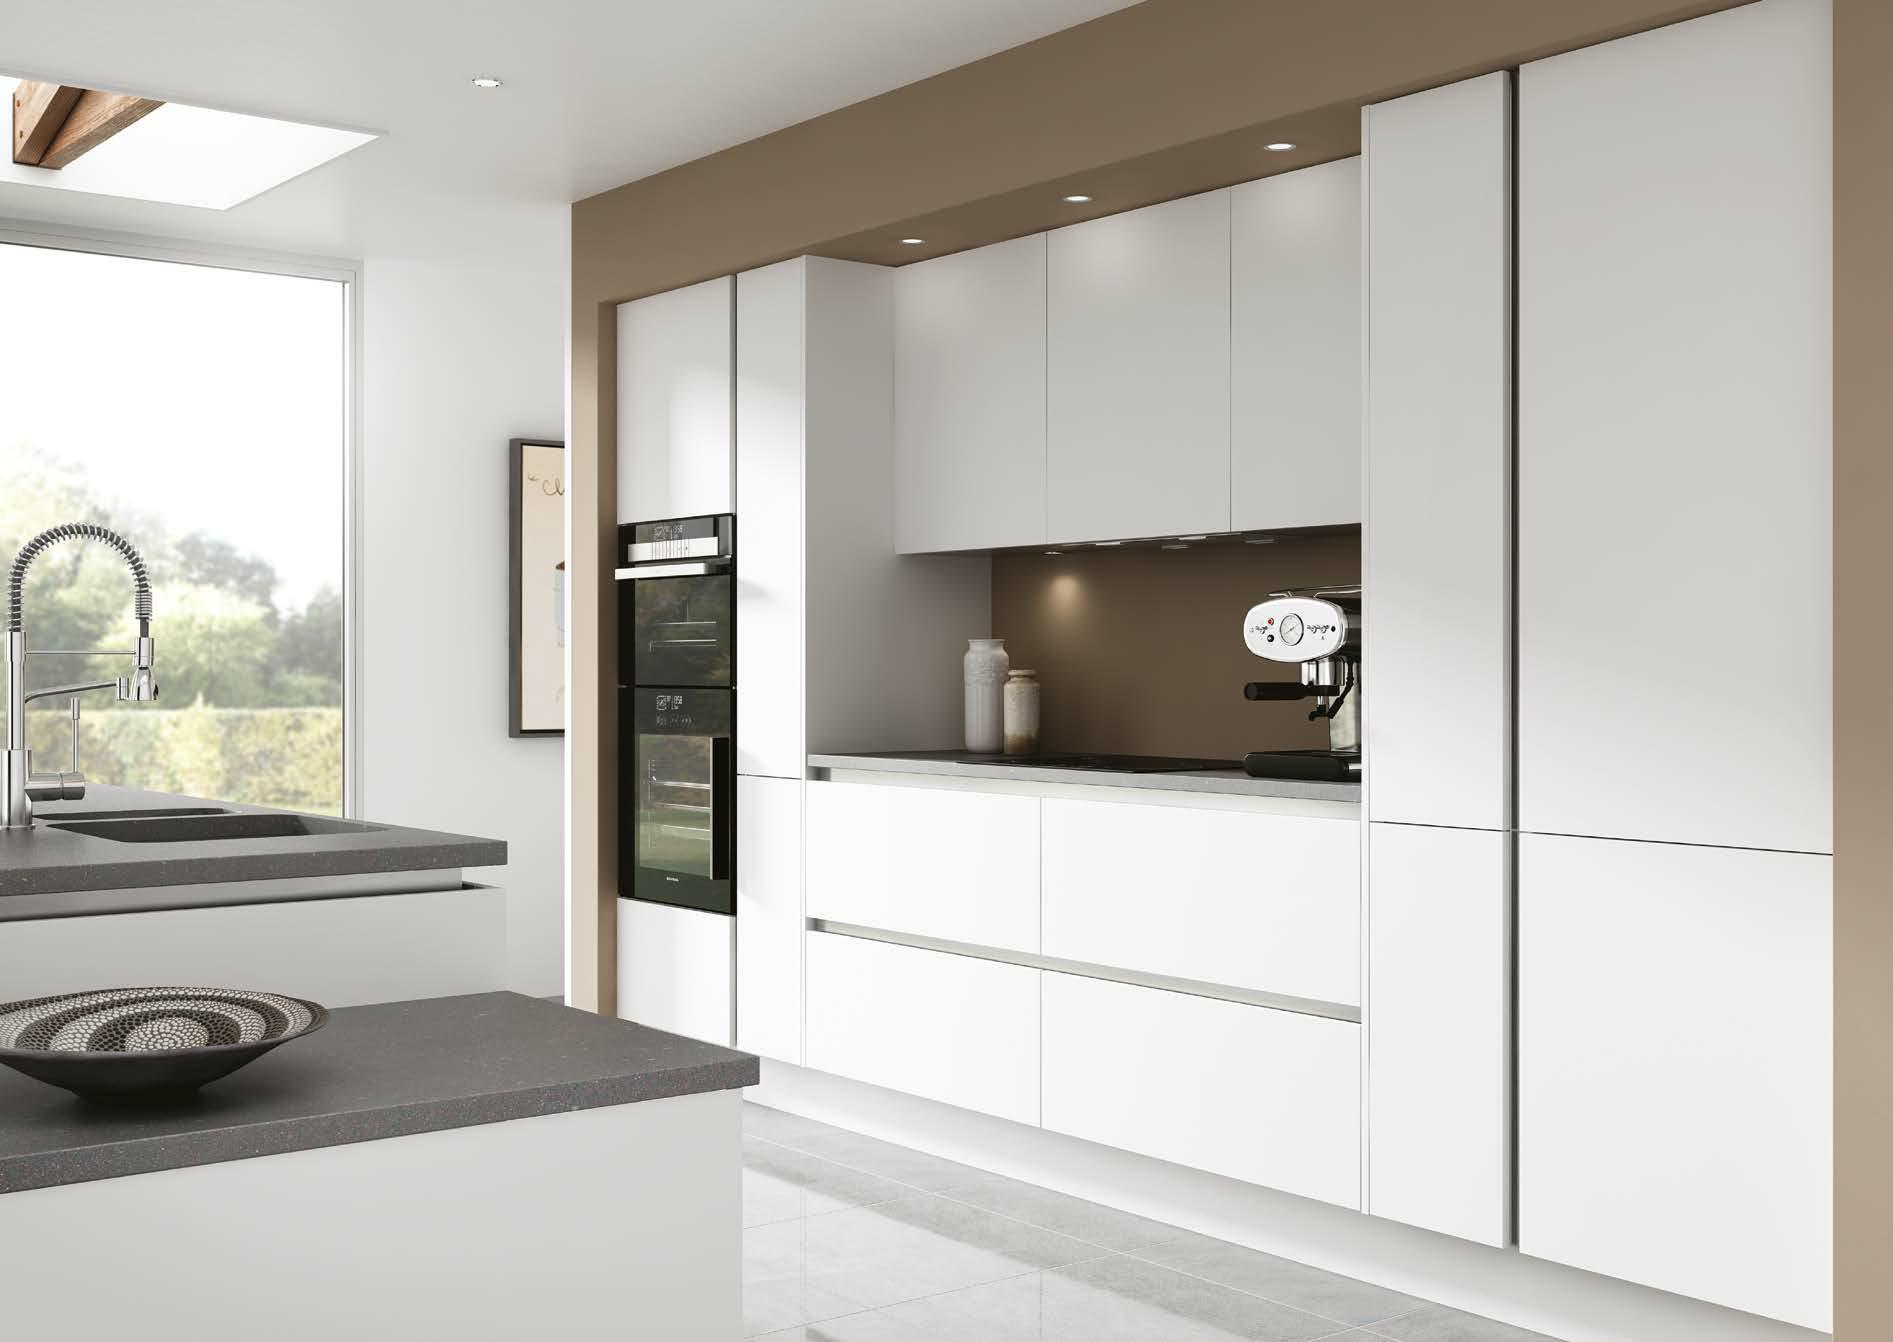 True Vista Matt White Handleless Kitchen By Sheraton Interiors - Fitted kitchen design ideas